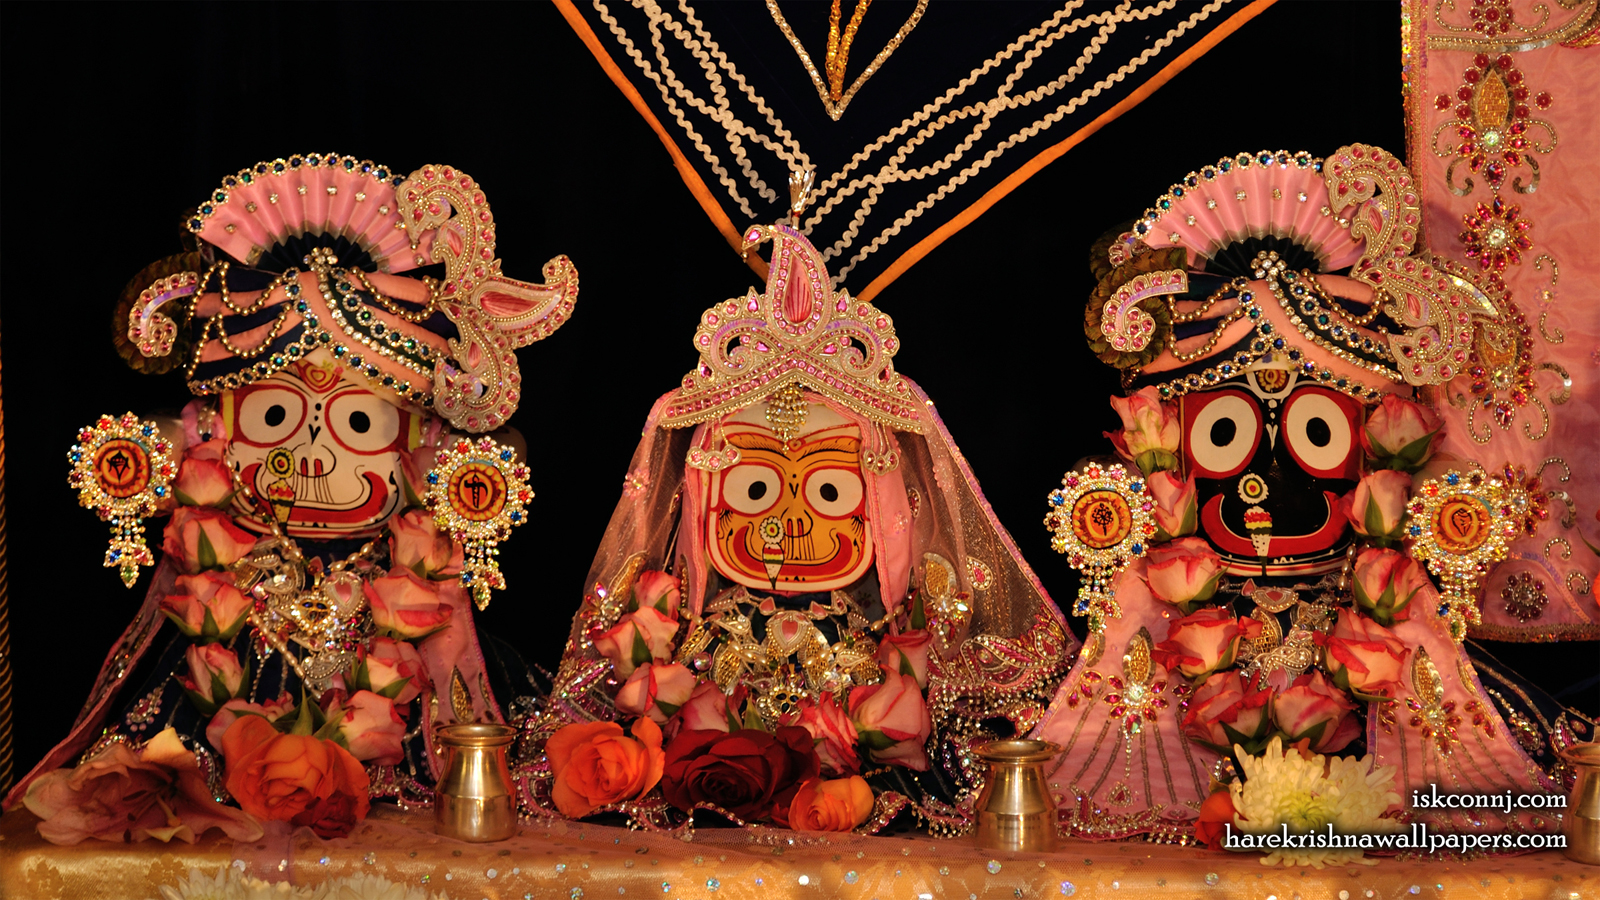 Jagannath Baladeva Subhadra Wallpaper (005) Size 1600x900 Download